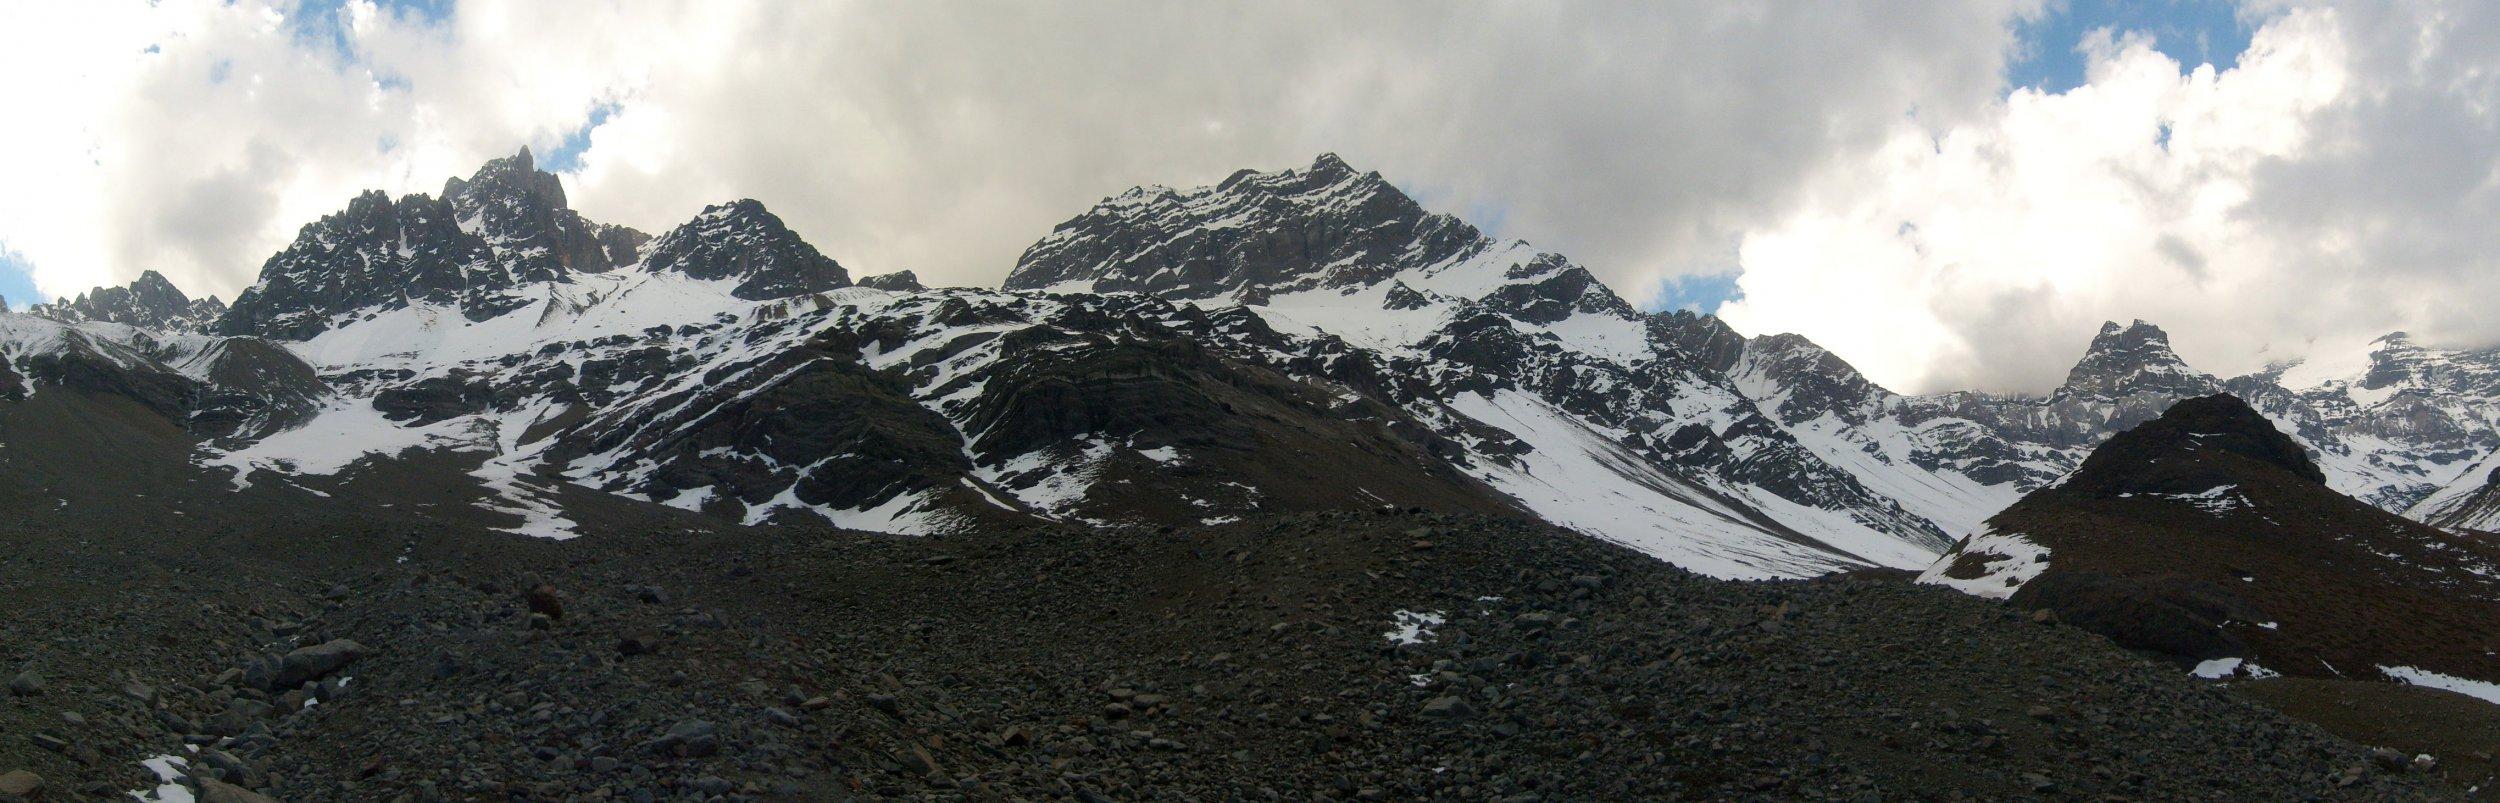 valle.thumb.jpg.d34e17ecdc7e7d61f855df16919e30af.jpg